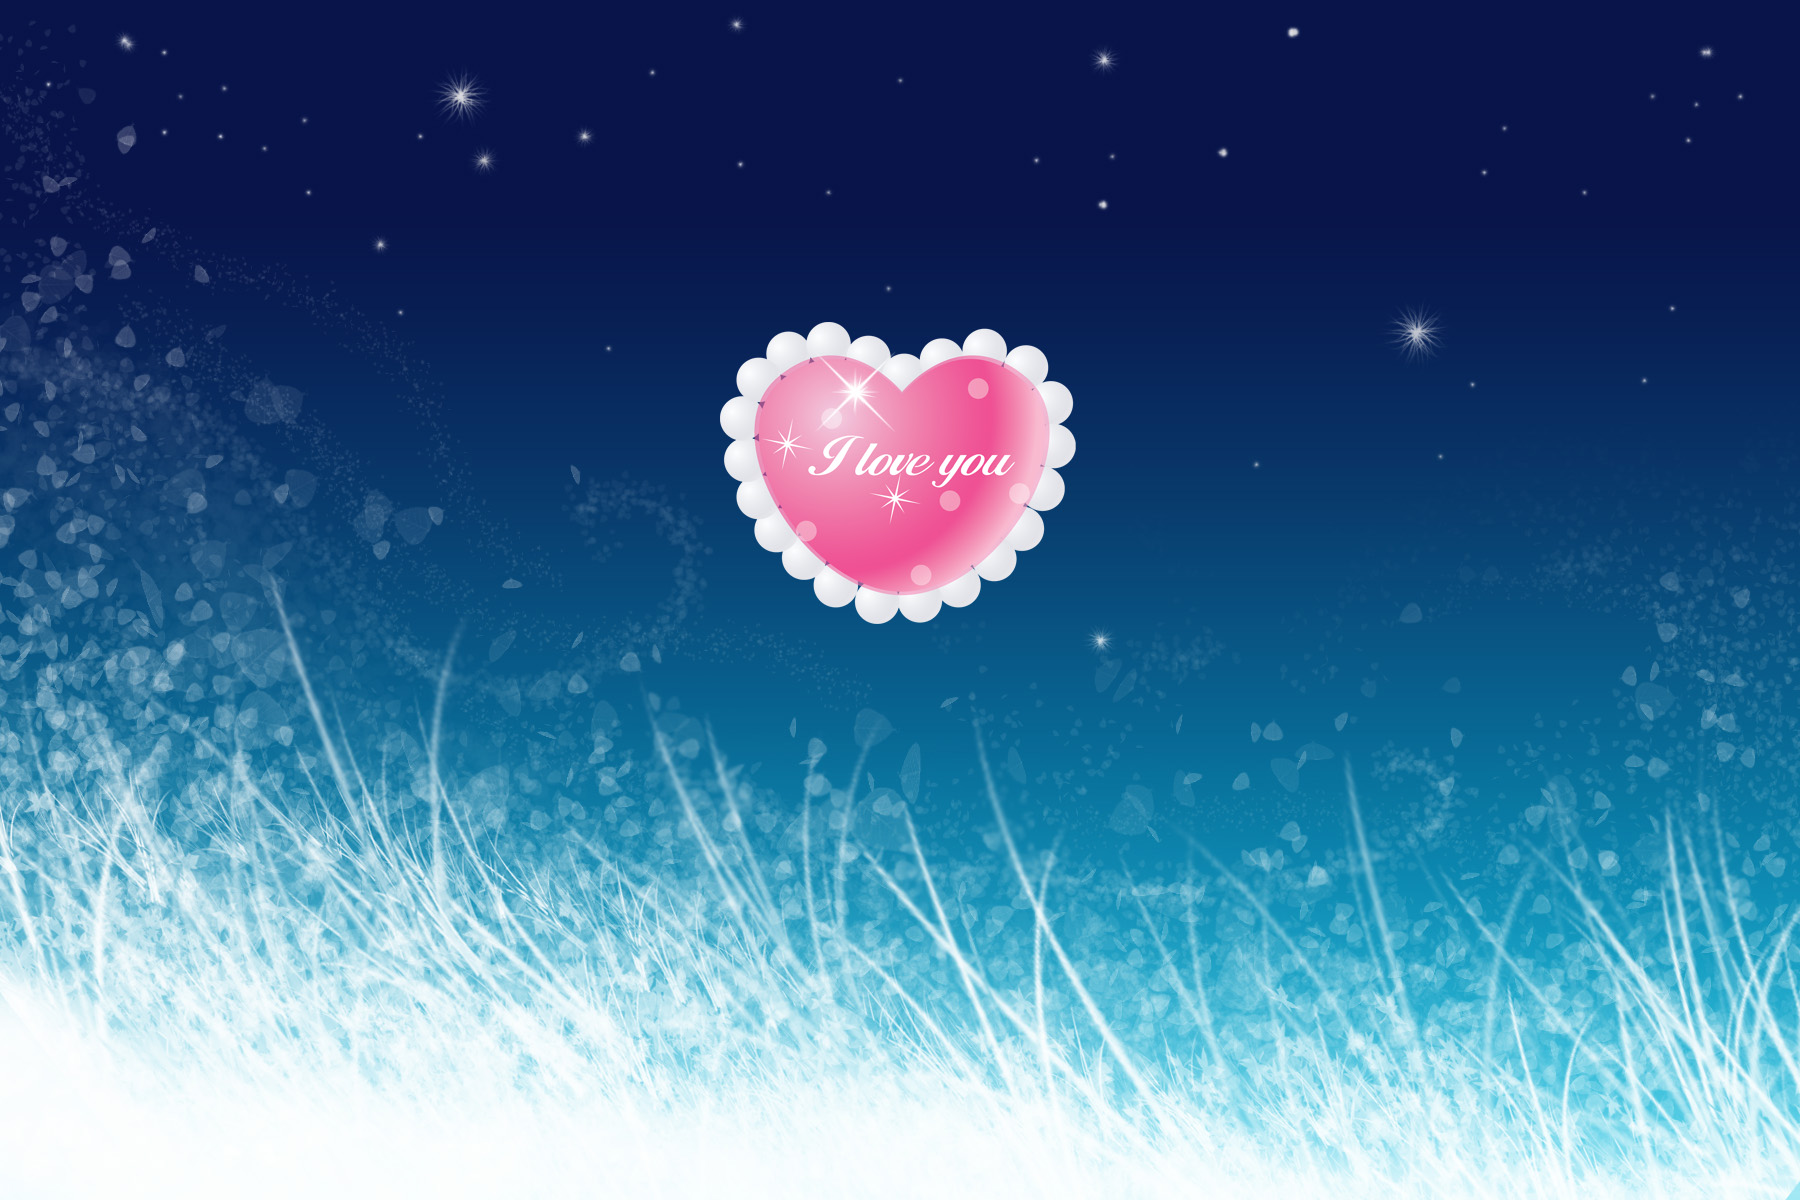 I love you by michaelmknight